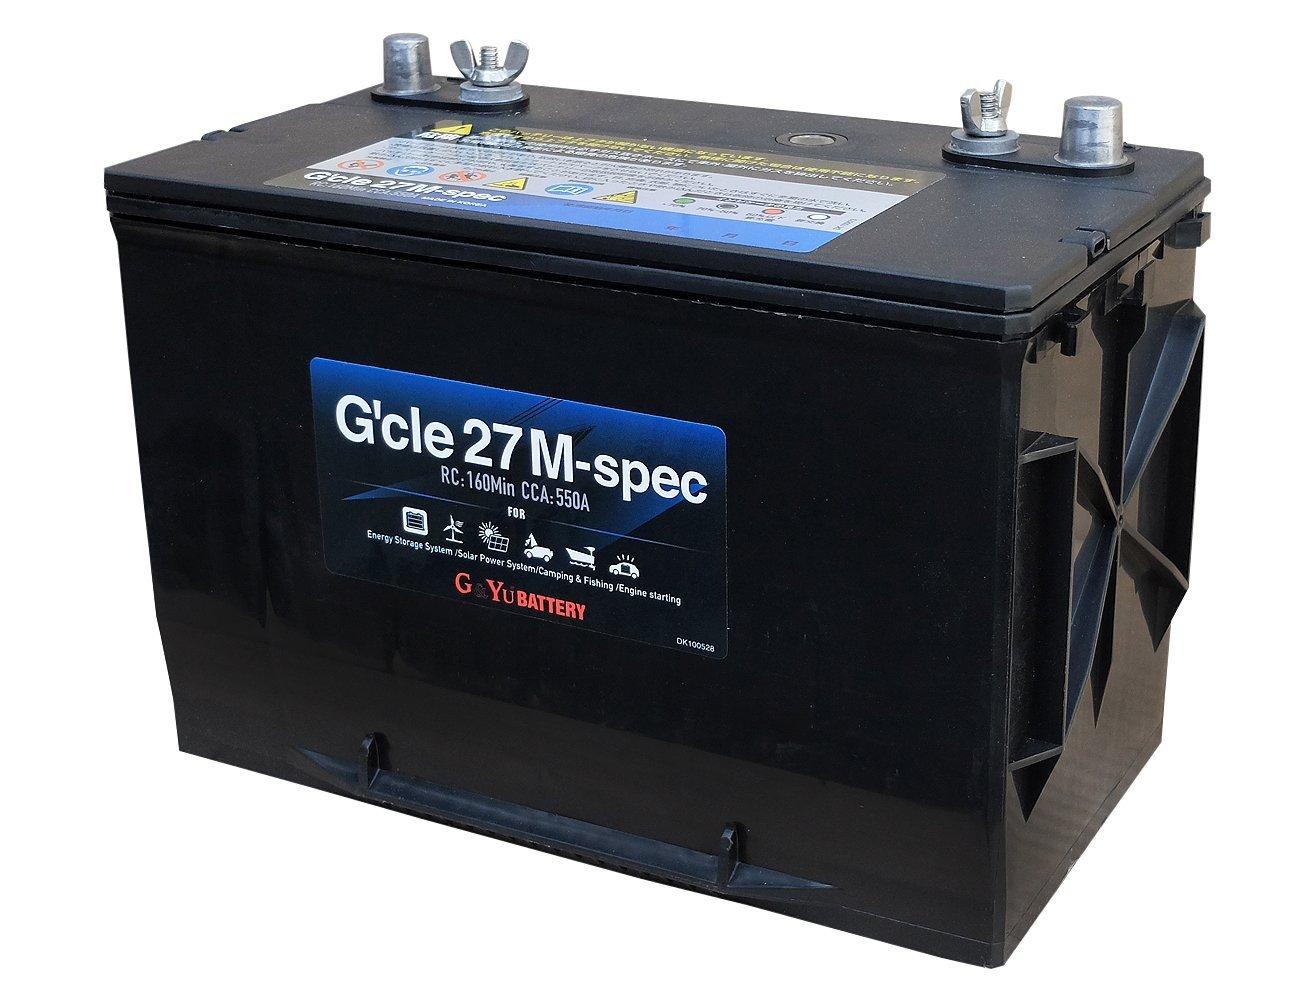 G&Yu[ジーアンドユー] 新ディープサイクルバッテリー G'cle27M-spec(ACデルコ M27MF互換) 高品質・長寿命グレードアップ版